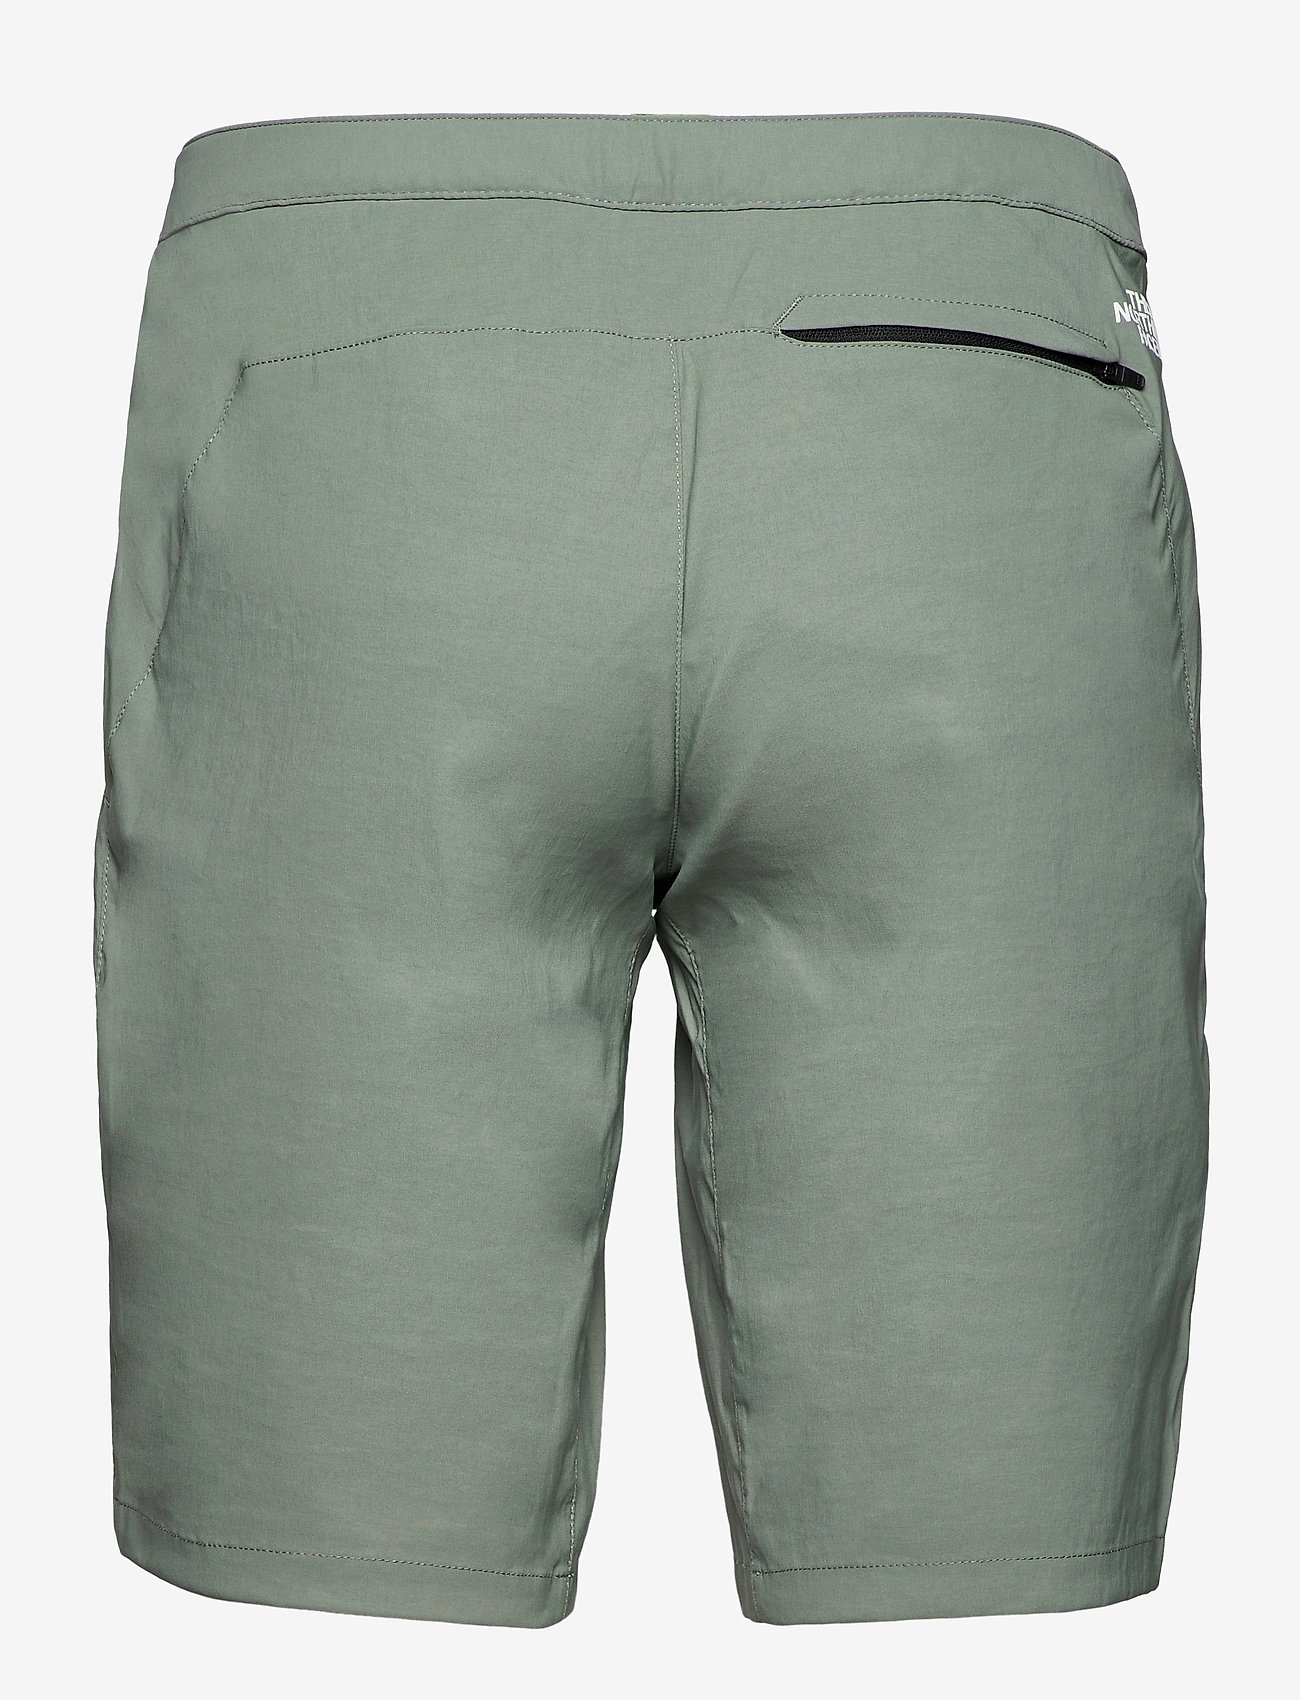 The North Face - M LIGHTNING SHT - wandel korte broek - agave green - 1